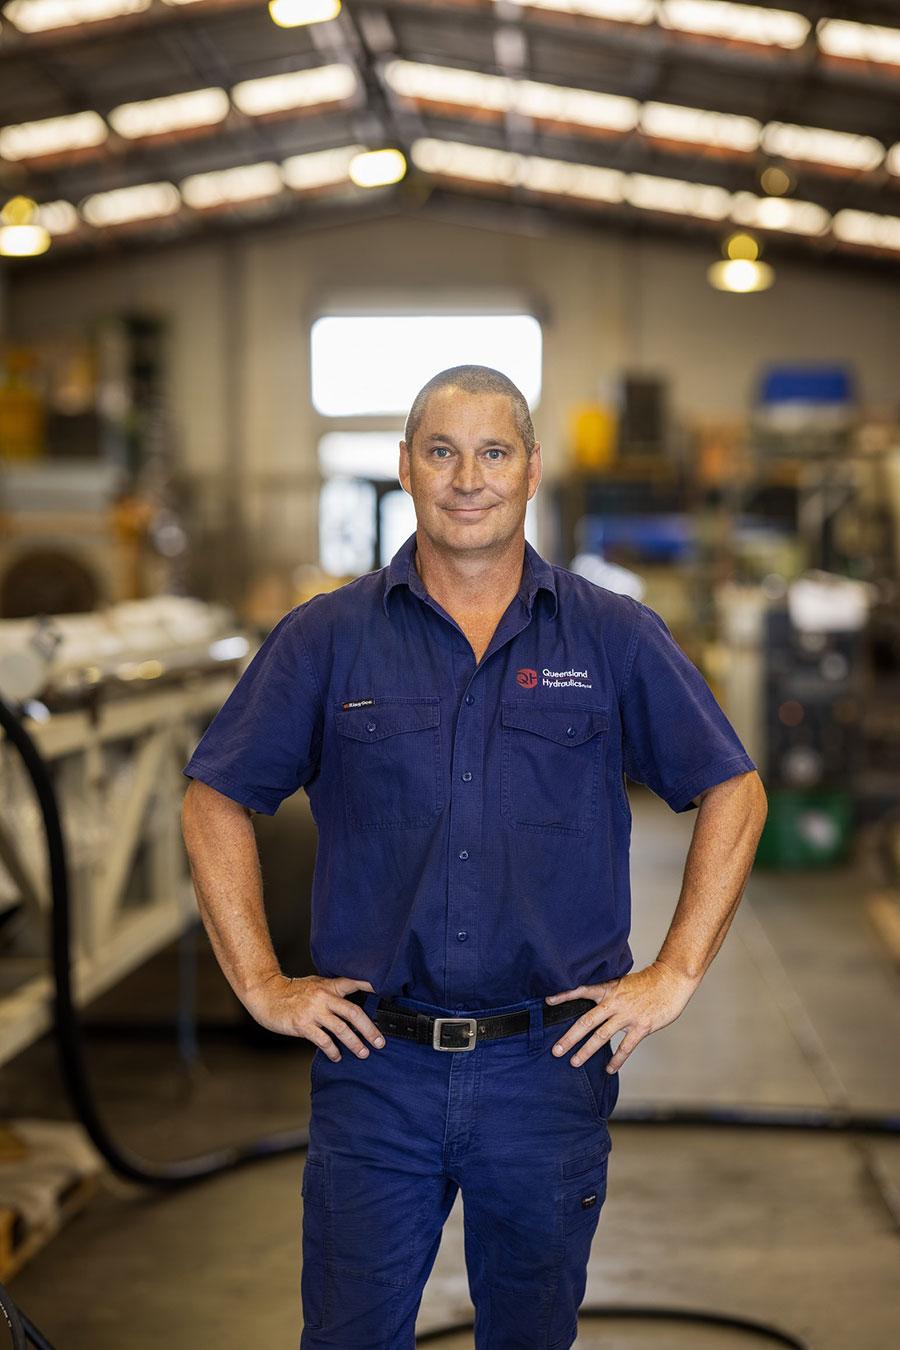 Paul Qld Hydraulics